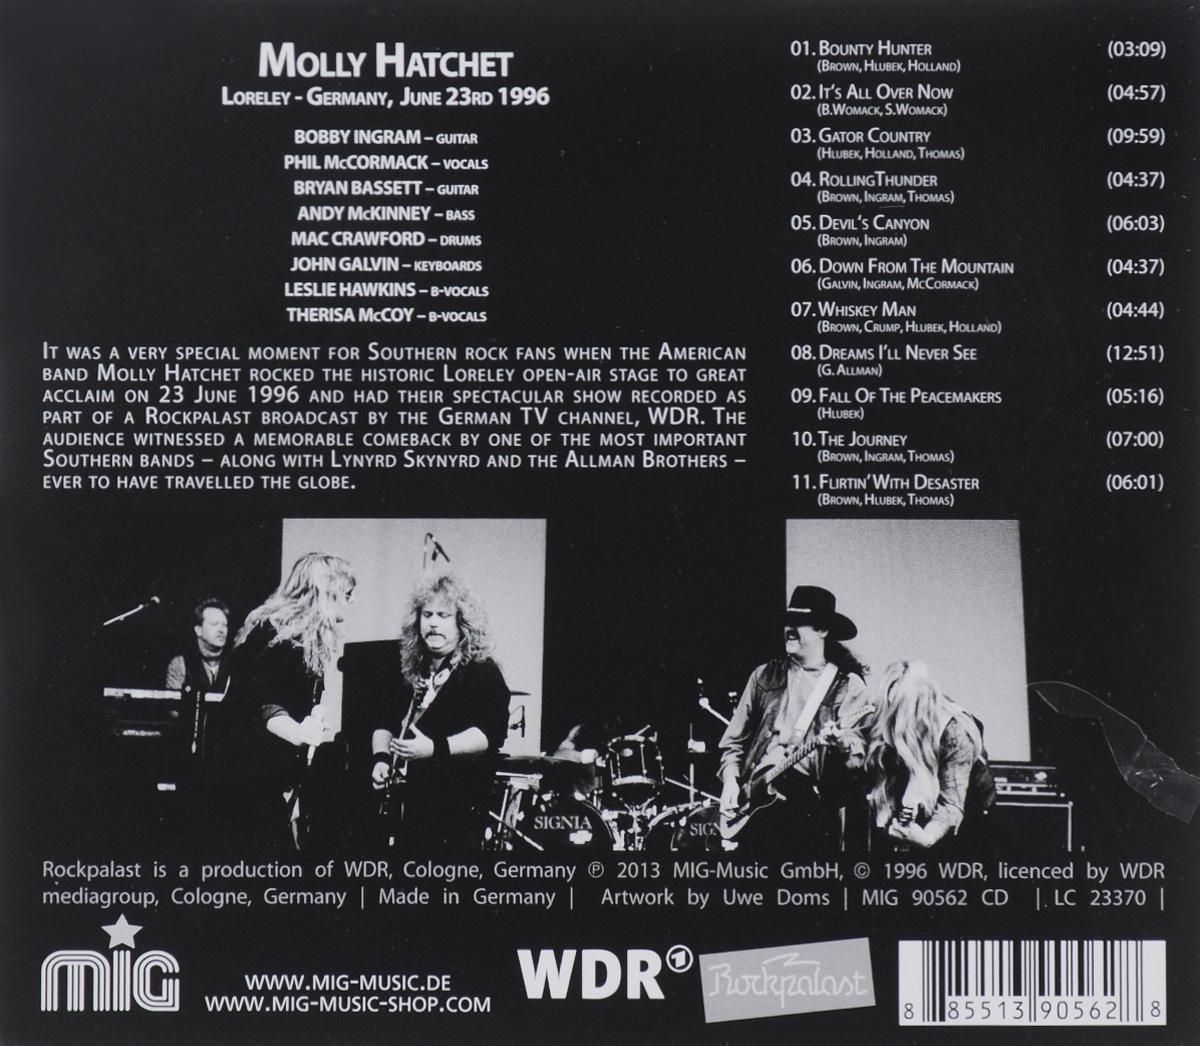 Molly Hatchet. Live At Rockpalast 1996. Молли Хатчет